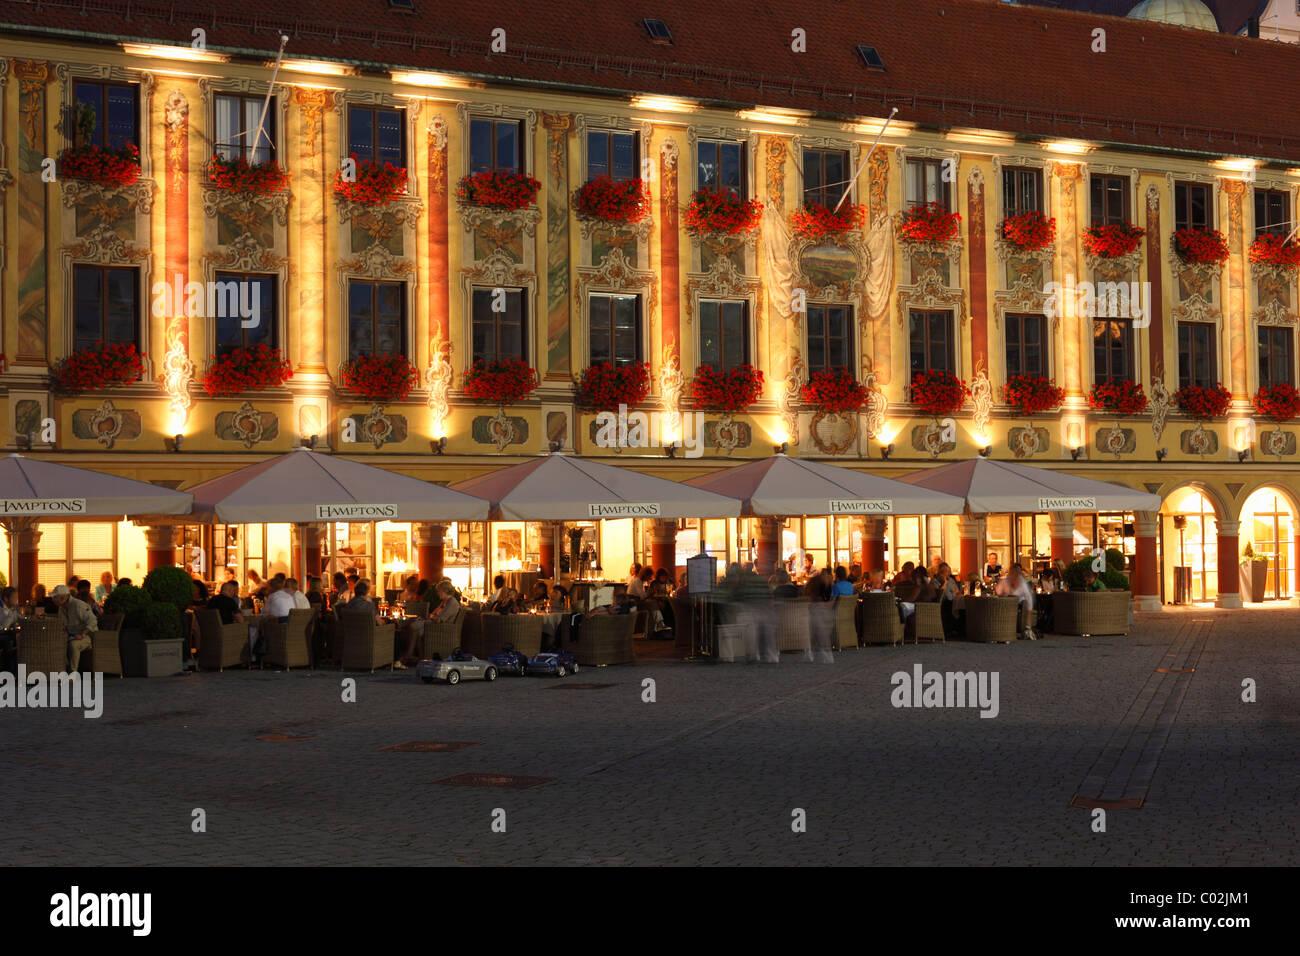 Café Hamptons in the Steuerhaus building on the market square, Memmingen, Unterallgaeu region, Allgaeu, Schwaben, - Stock Image